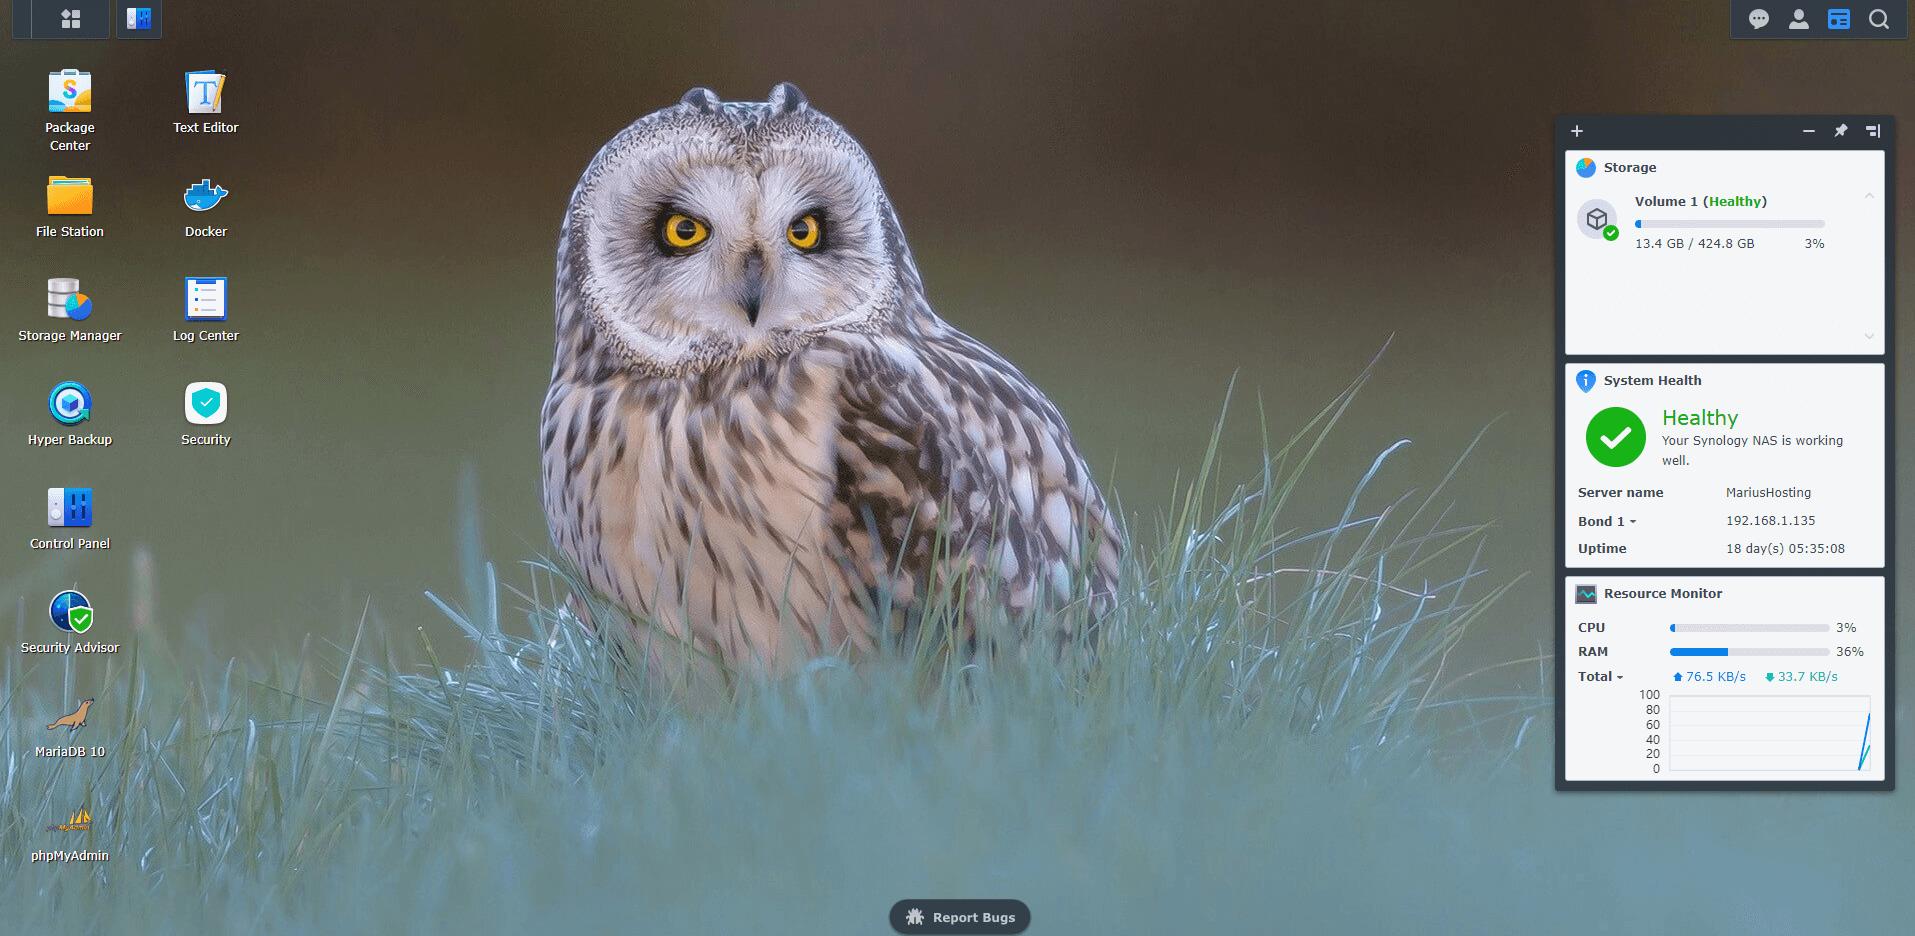 11 Synology Owl Wallpaper